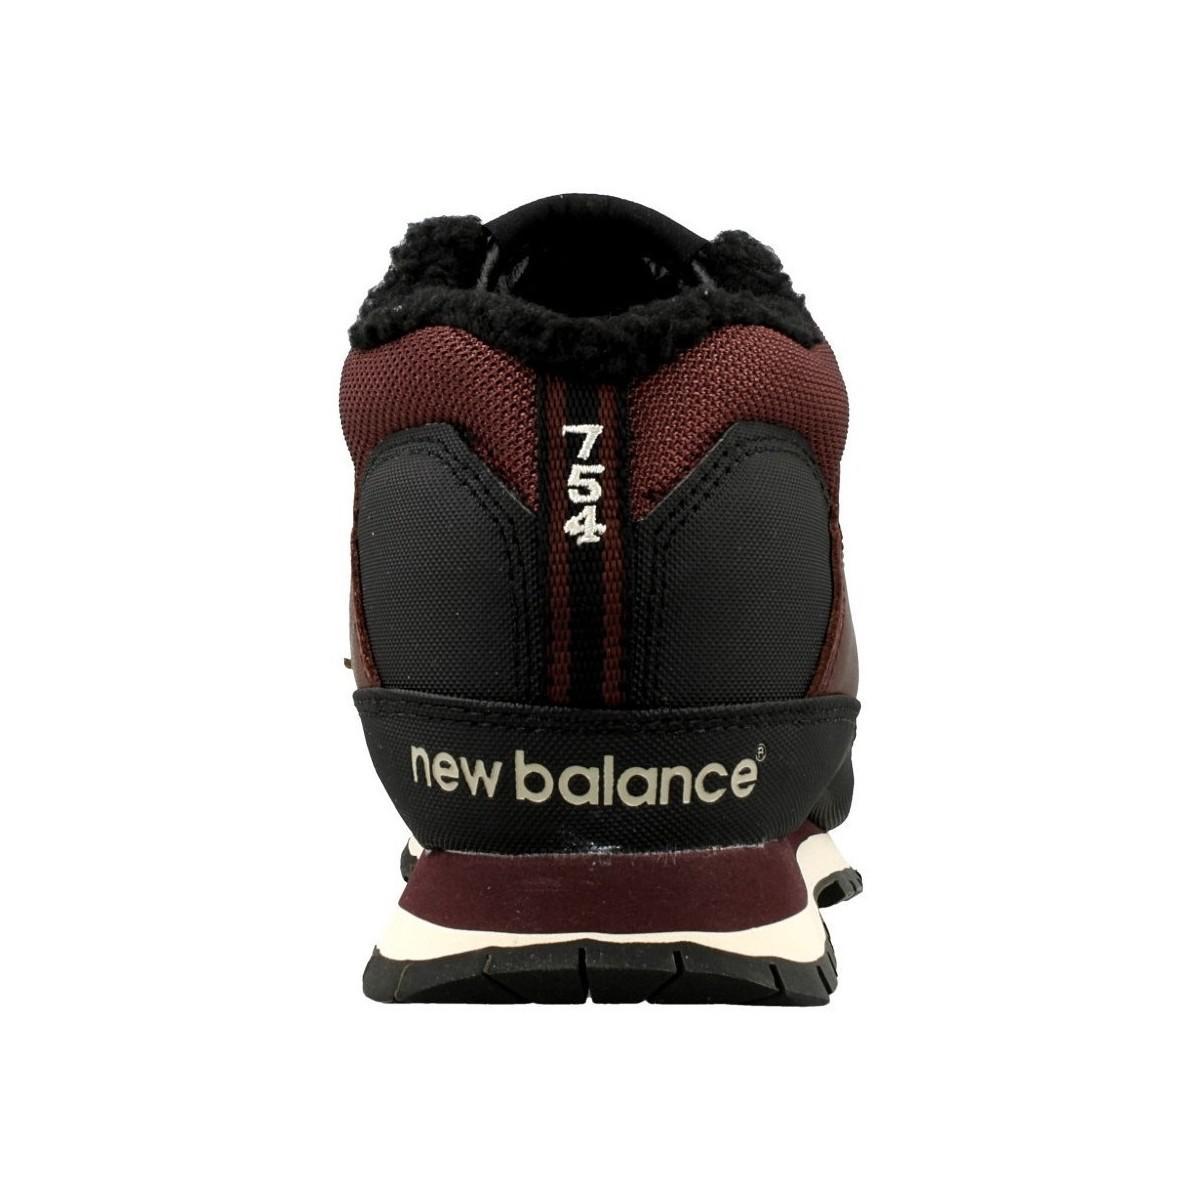 new balance hl 754